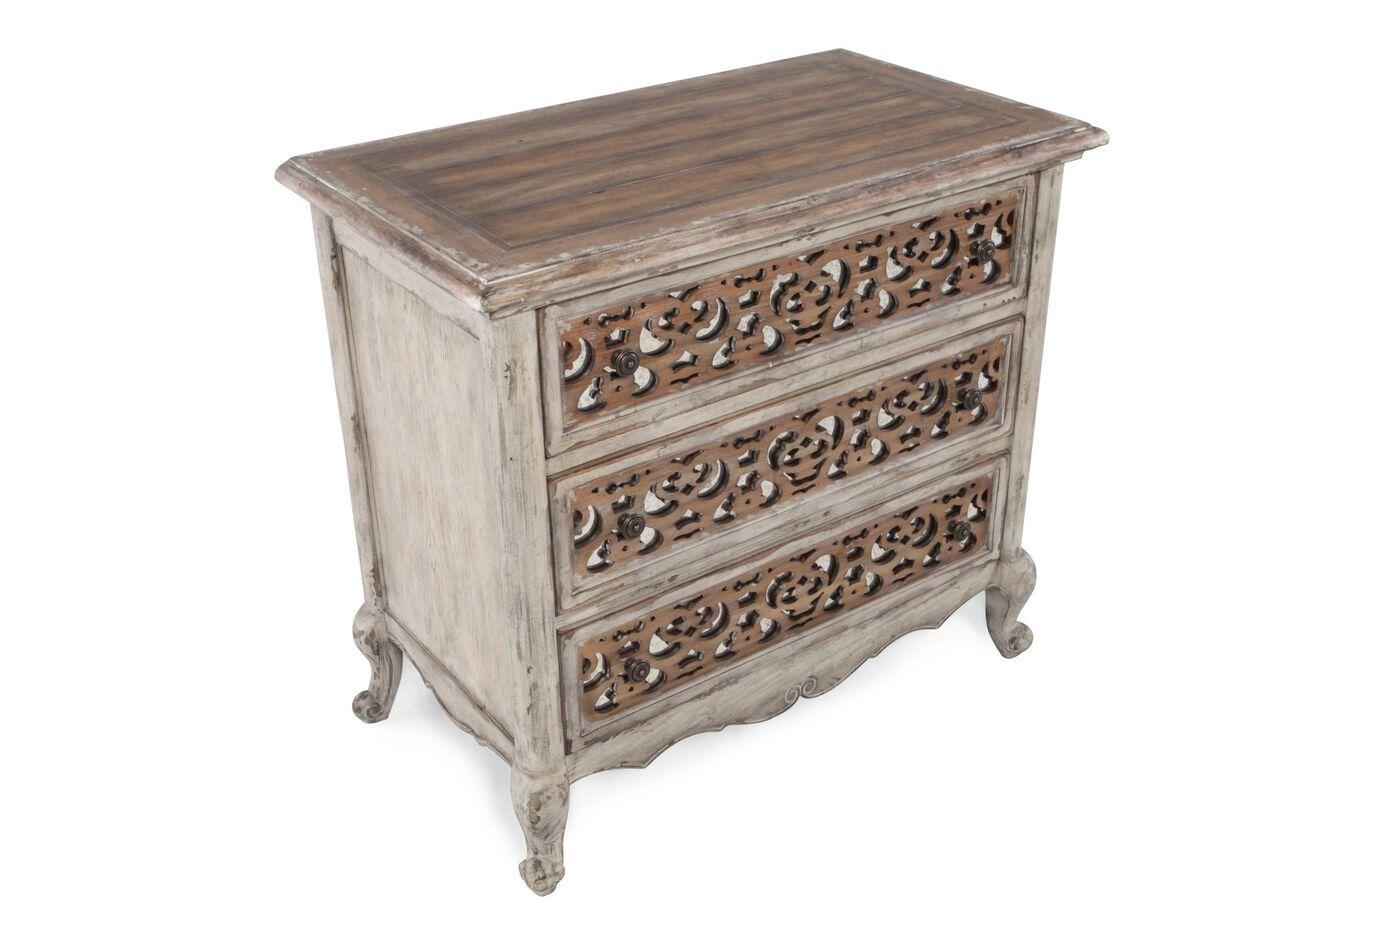 fretwork furniture. 33\u0026quot; Contemporary Solid Wood Three-Drawer Fretwork Nightstand\u0026nbsp Furniture